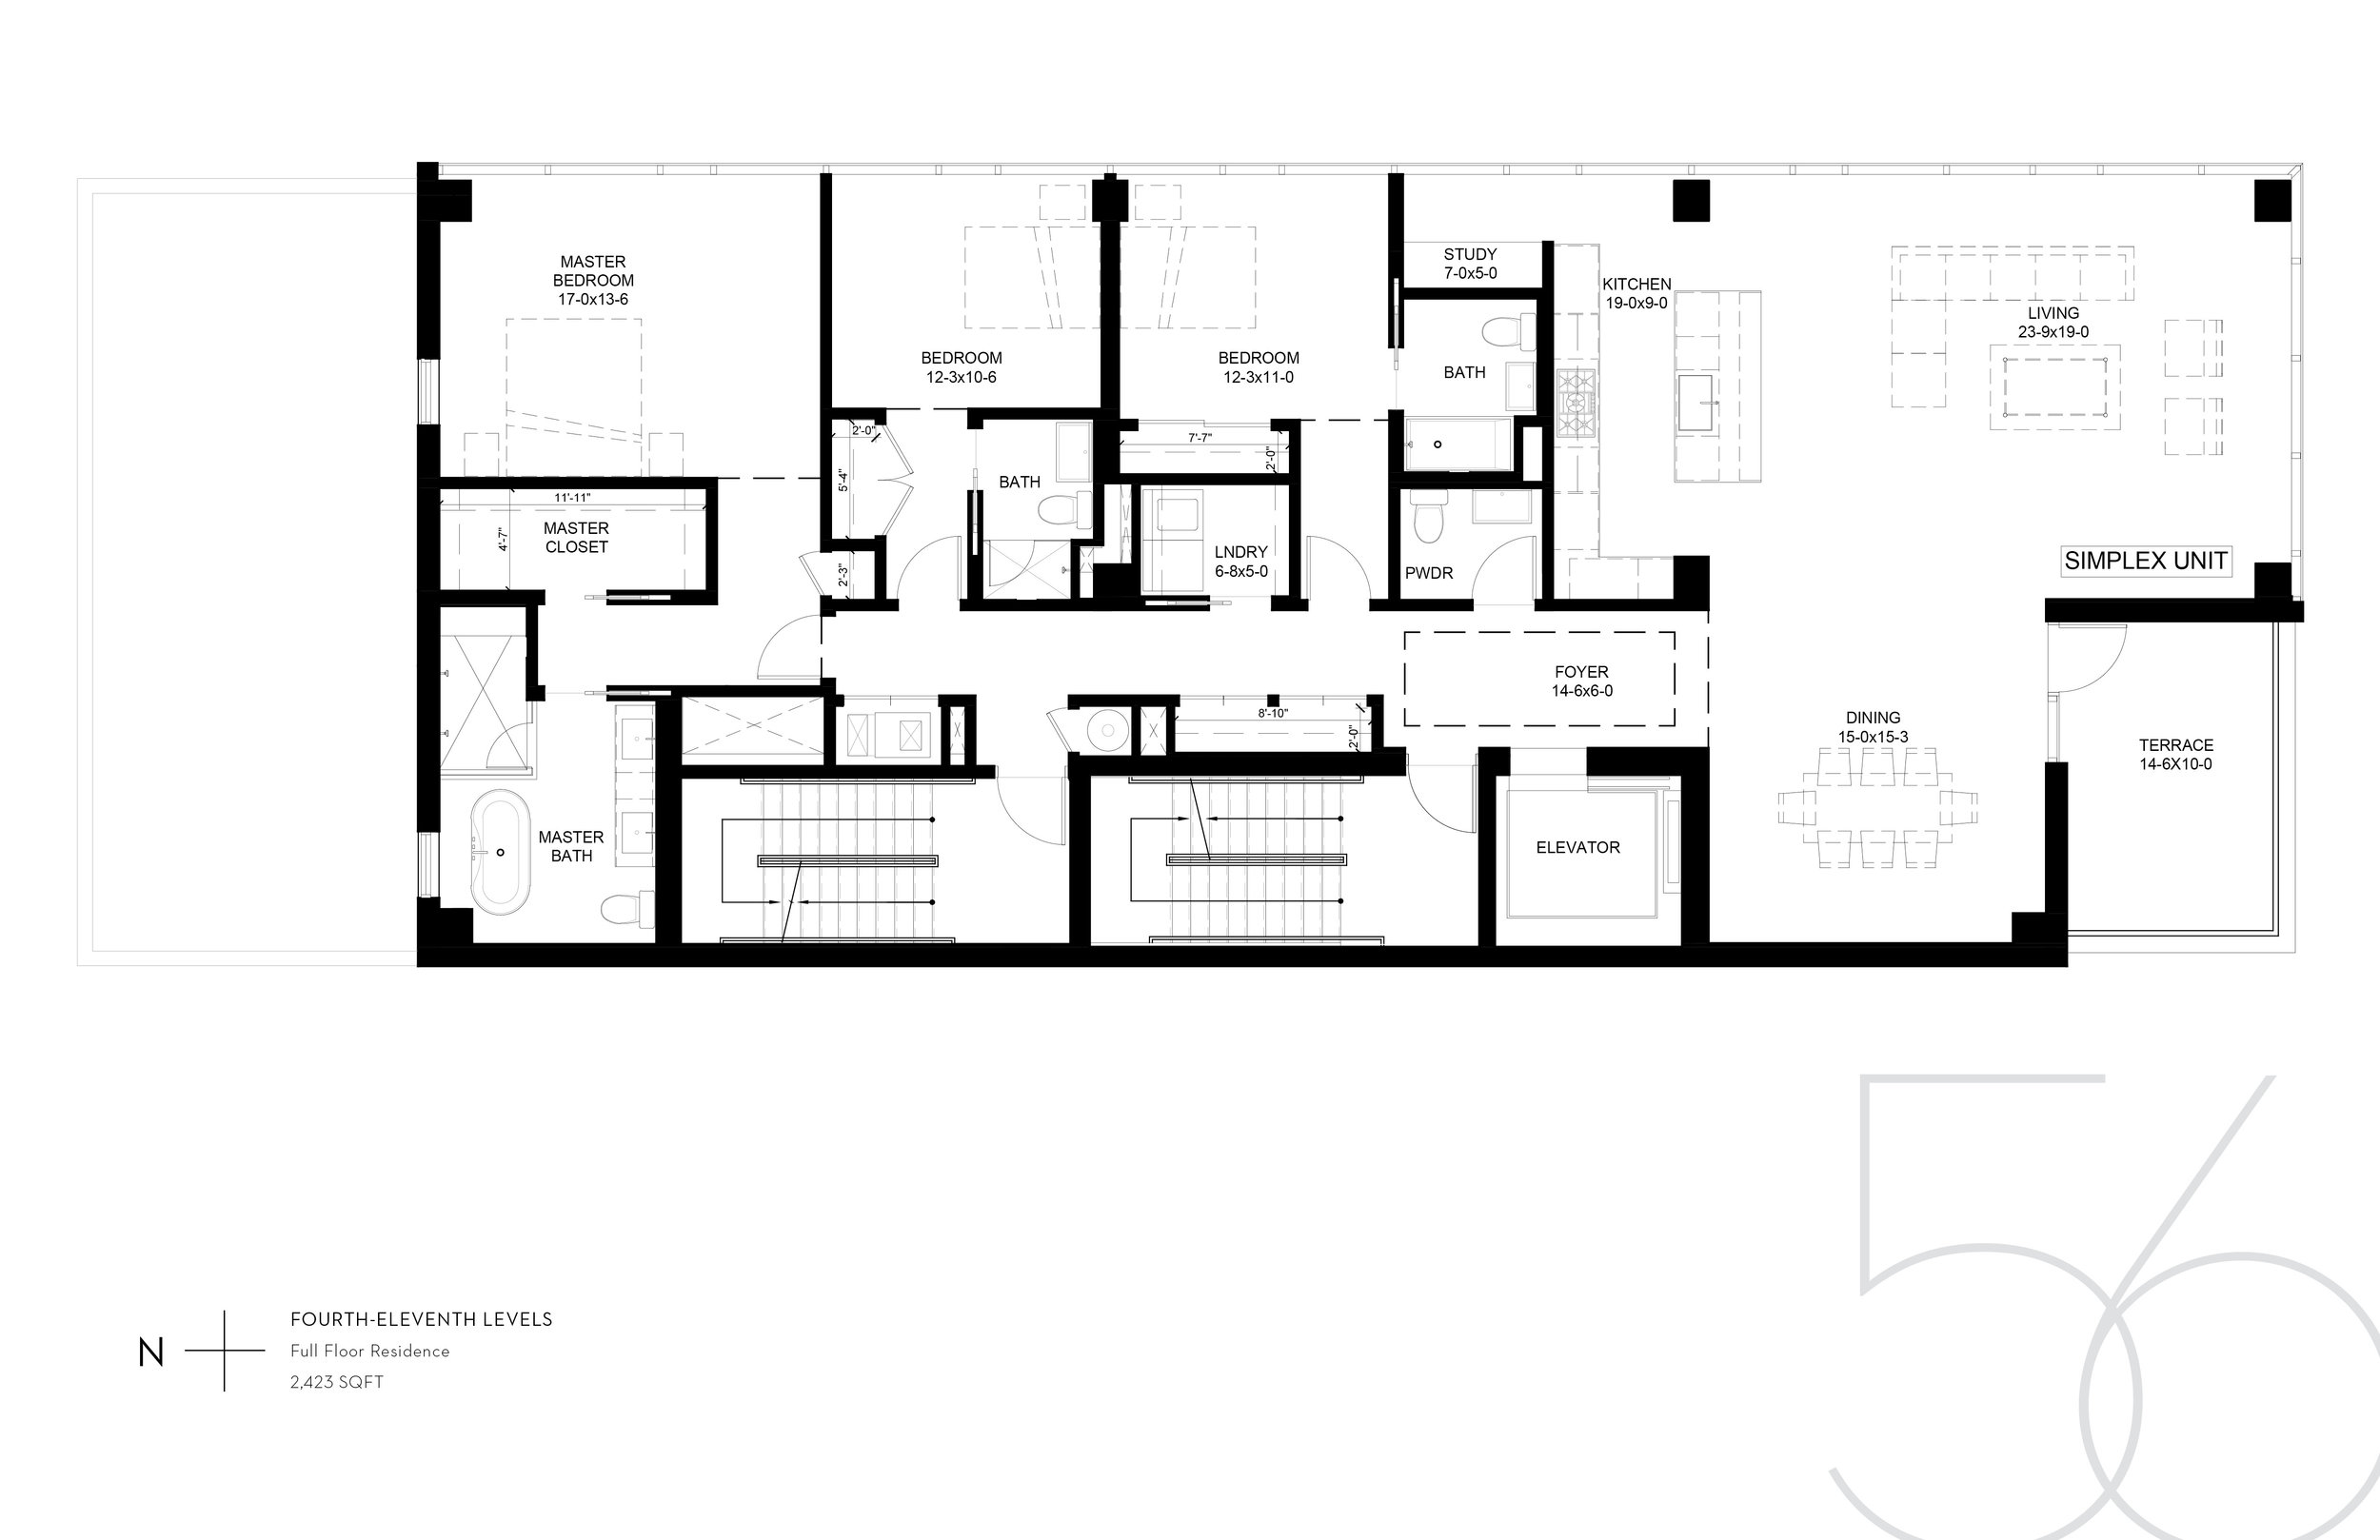 56Huron_floorplan_10-11-18_level4-11.jpg